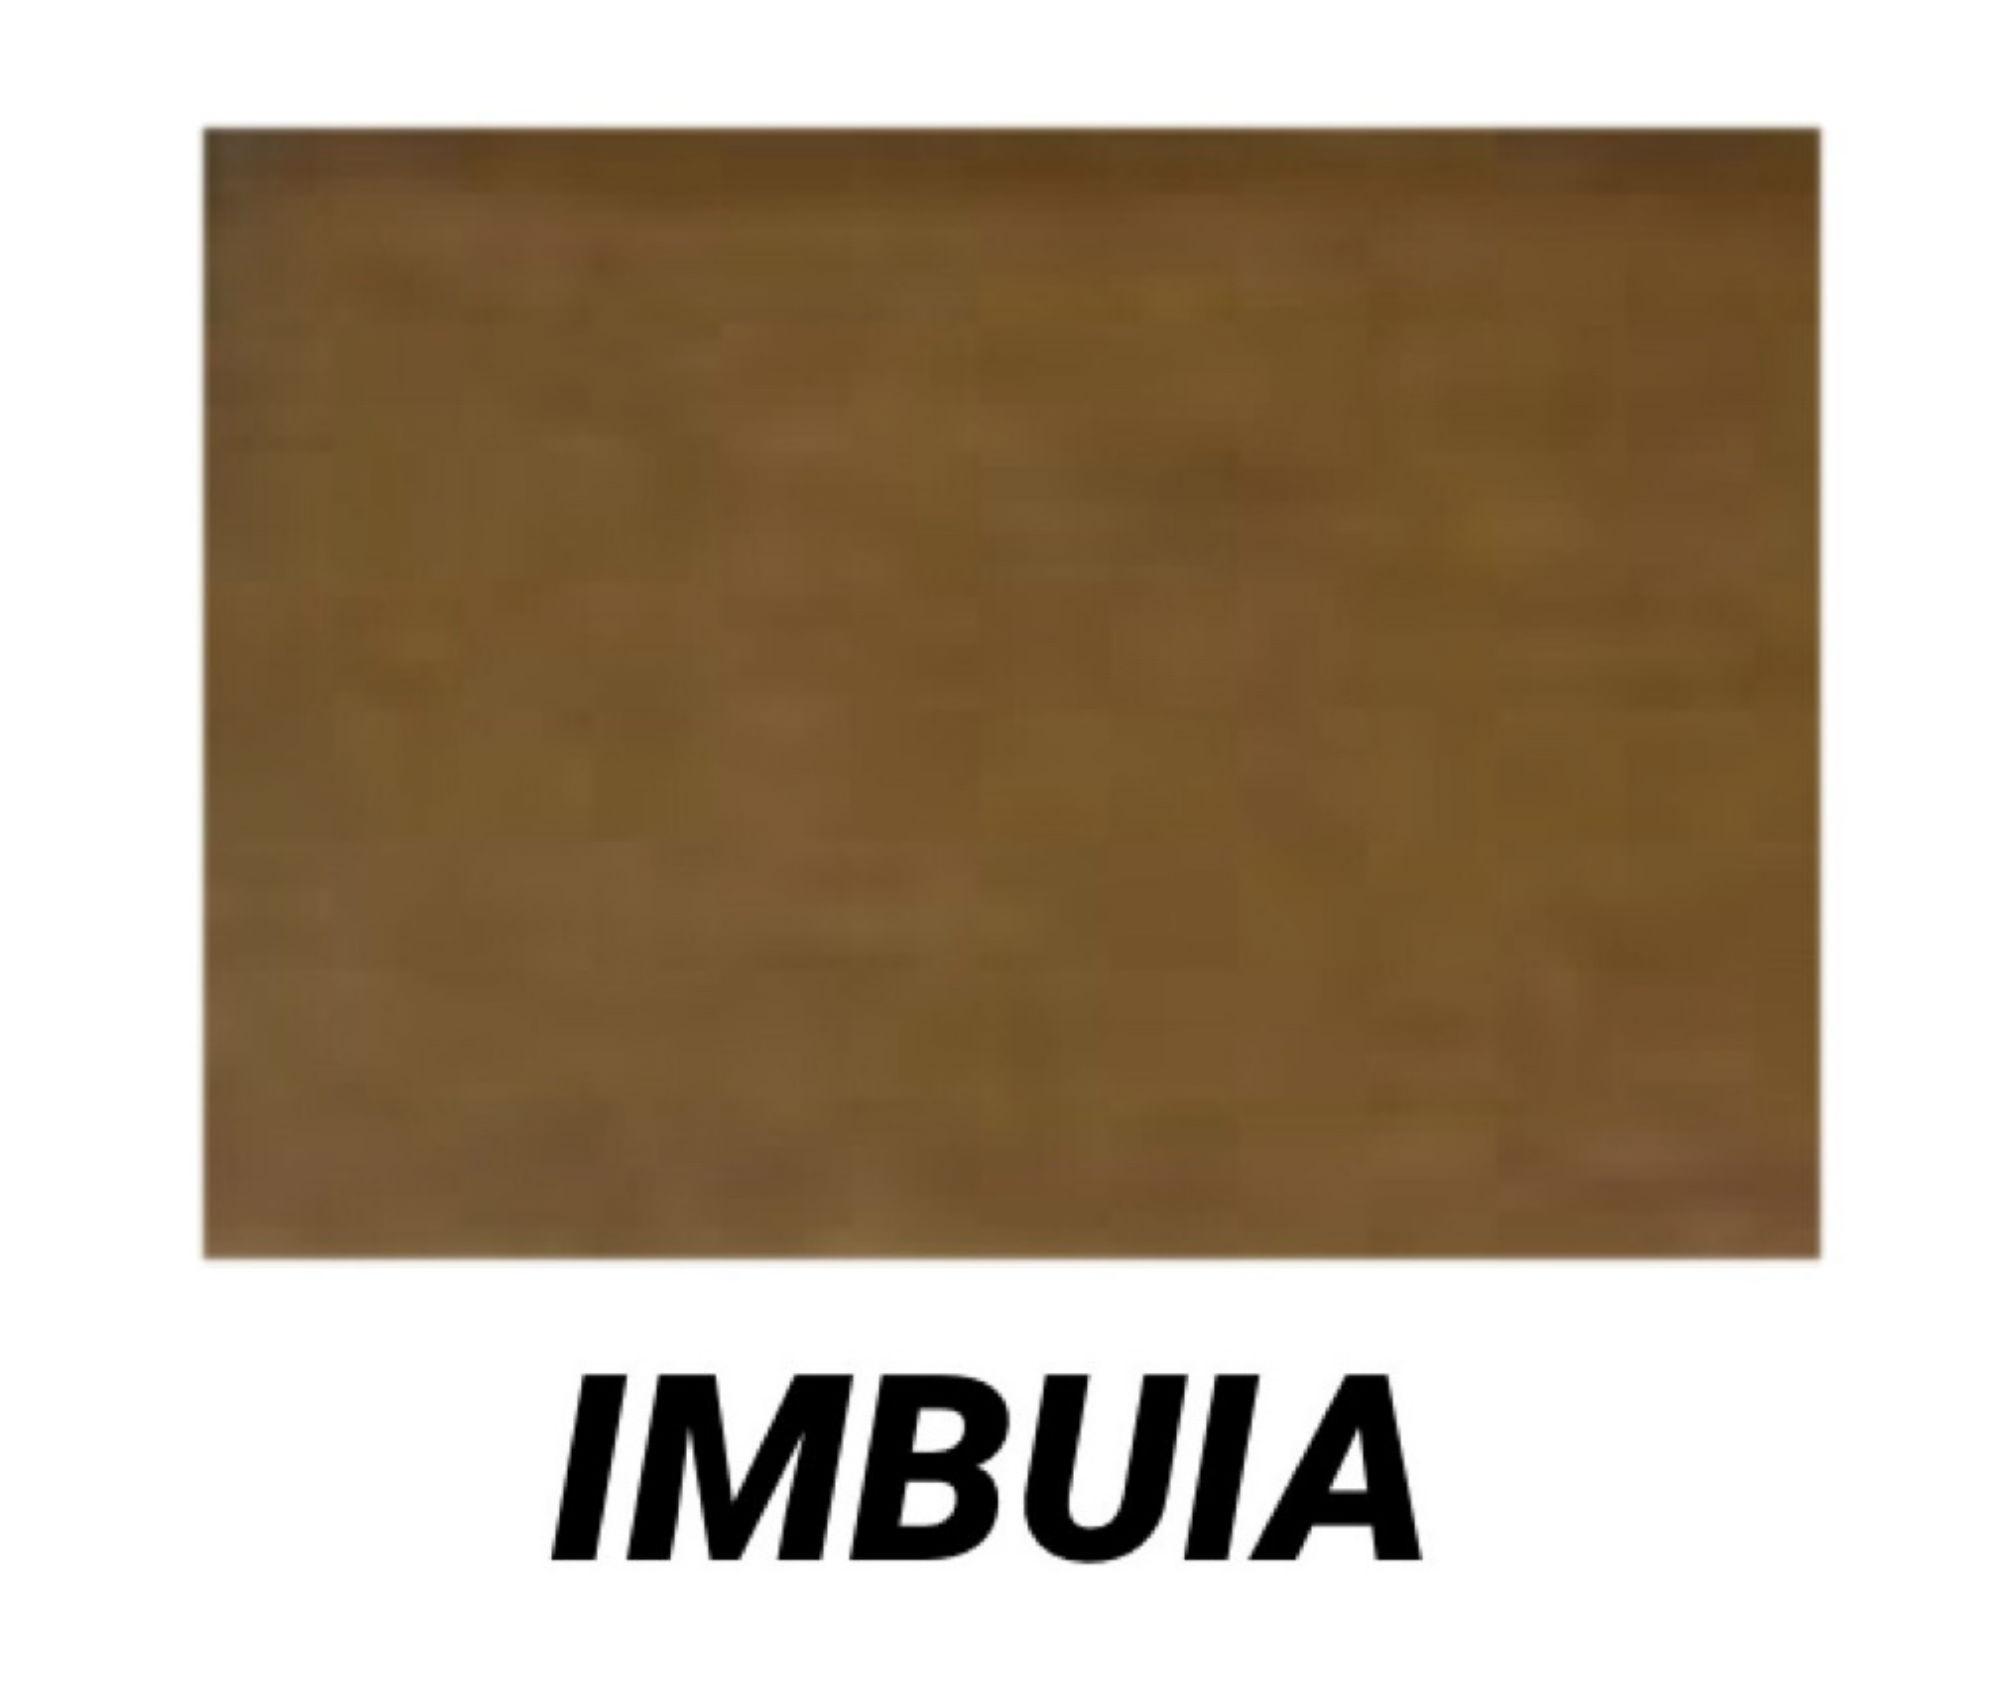 IMBUIA..